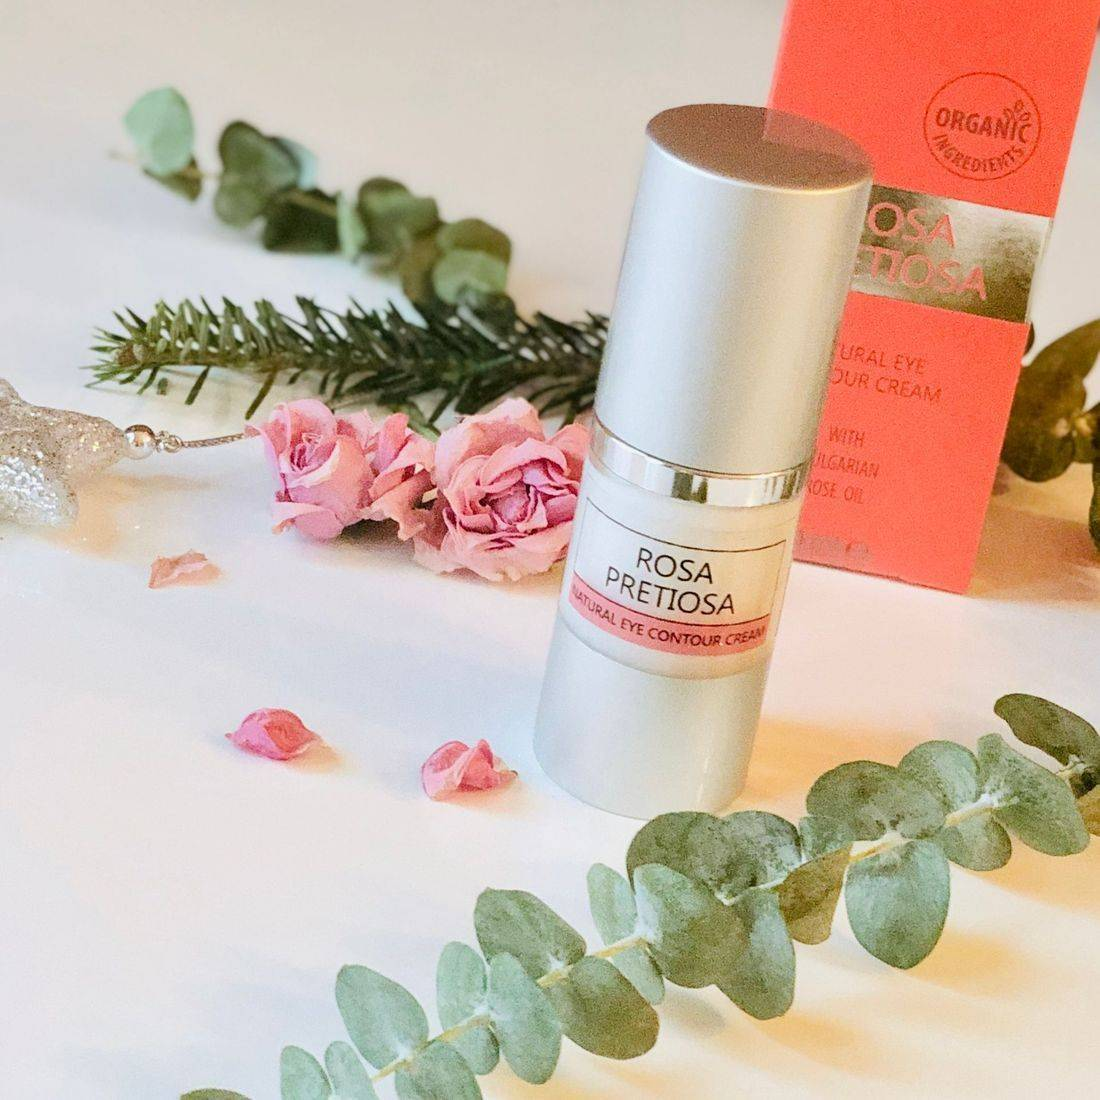 rose eye cream, rosa pretiosa skincare, organic skincare, best rose-infused beauty, rose water